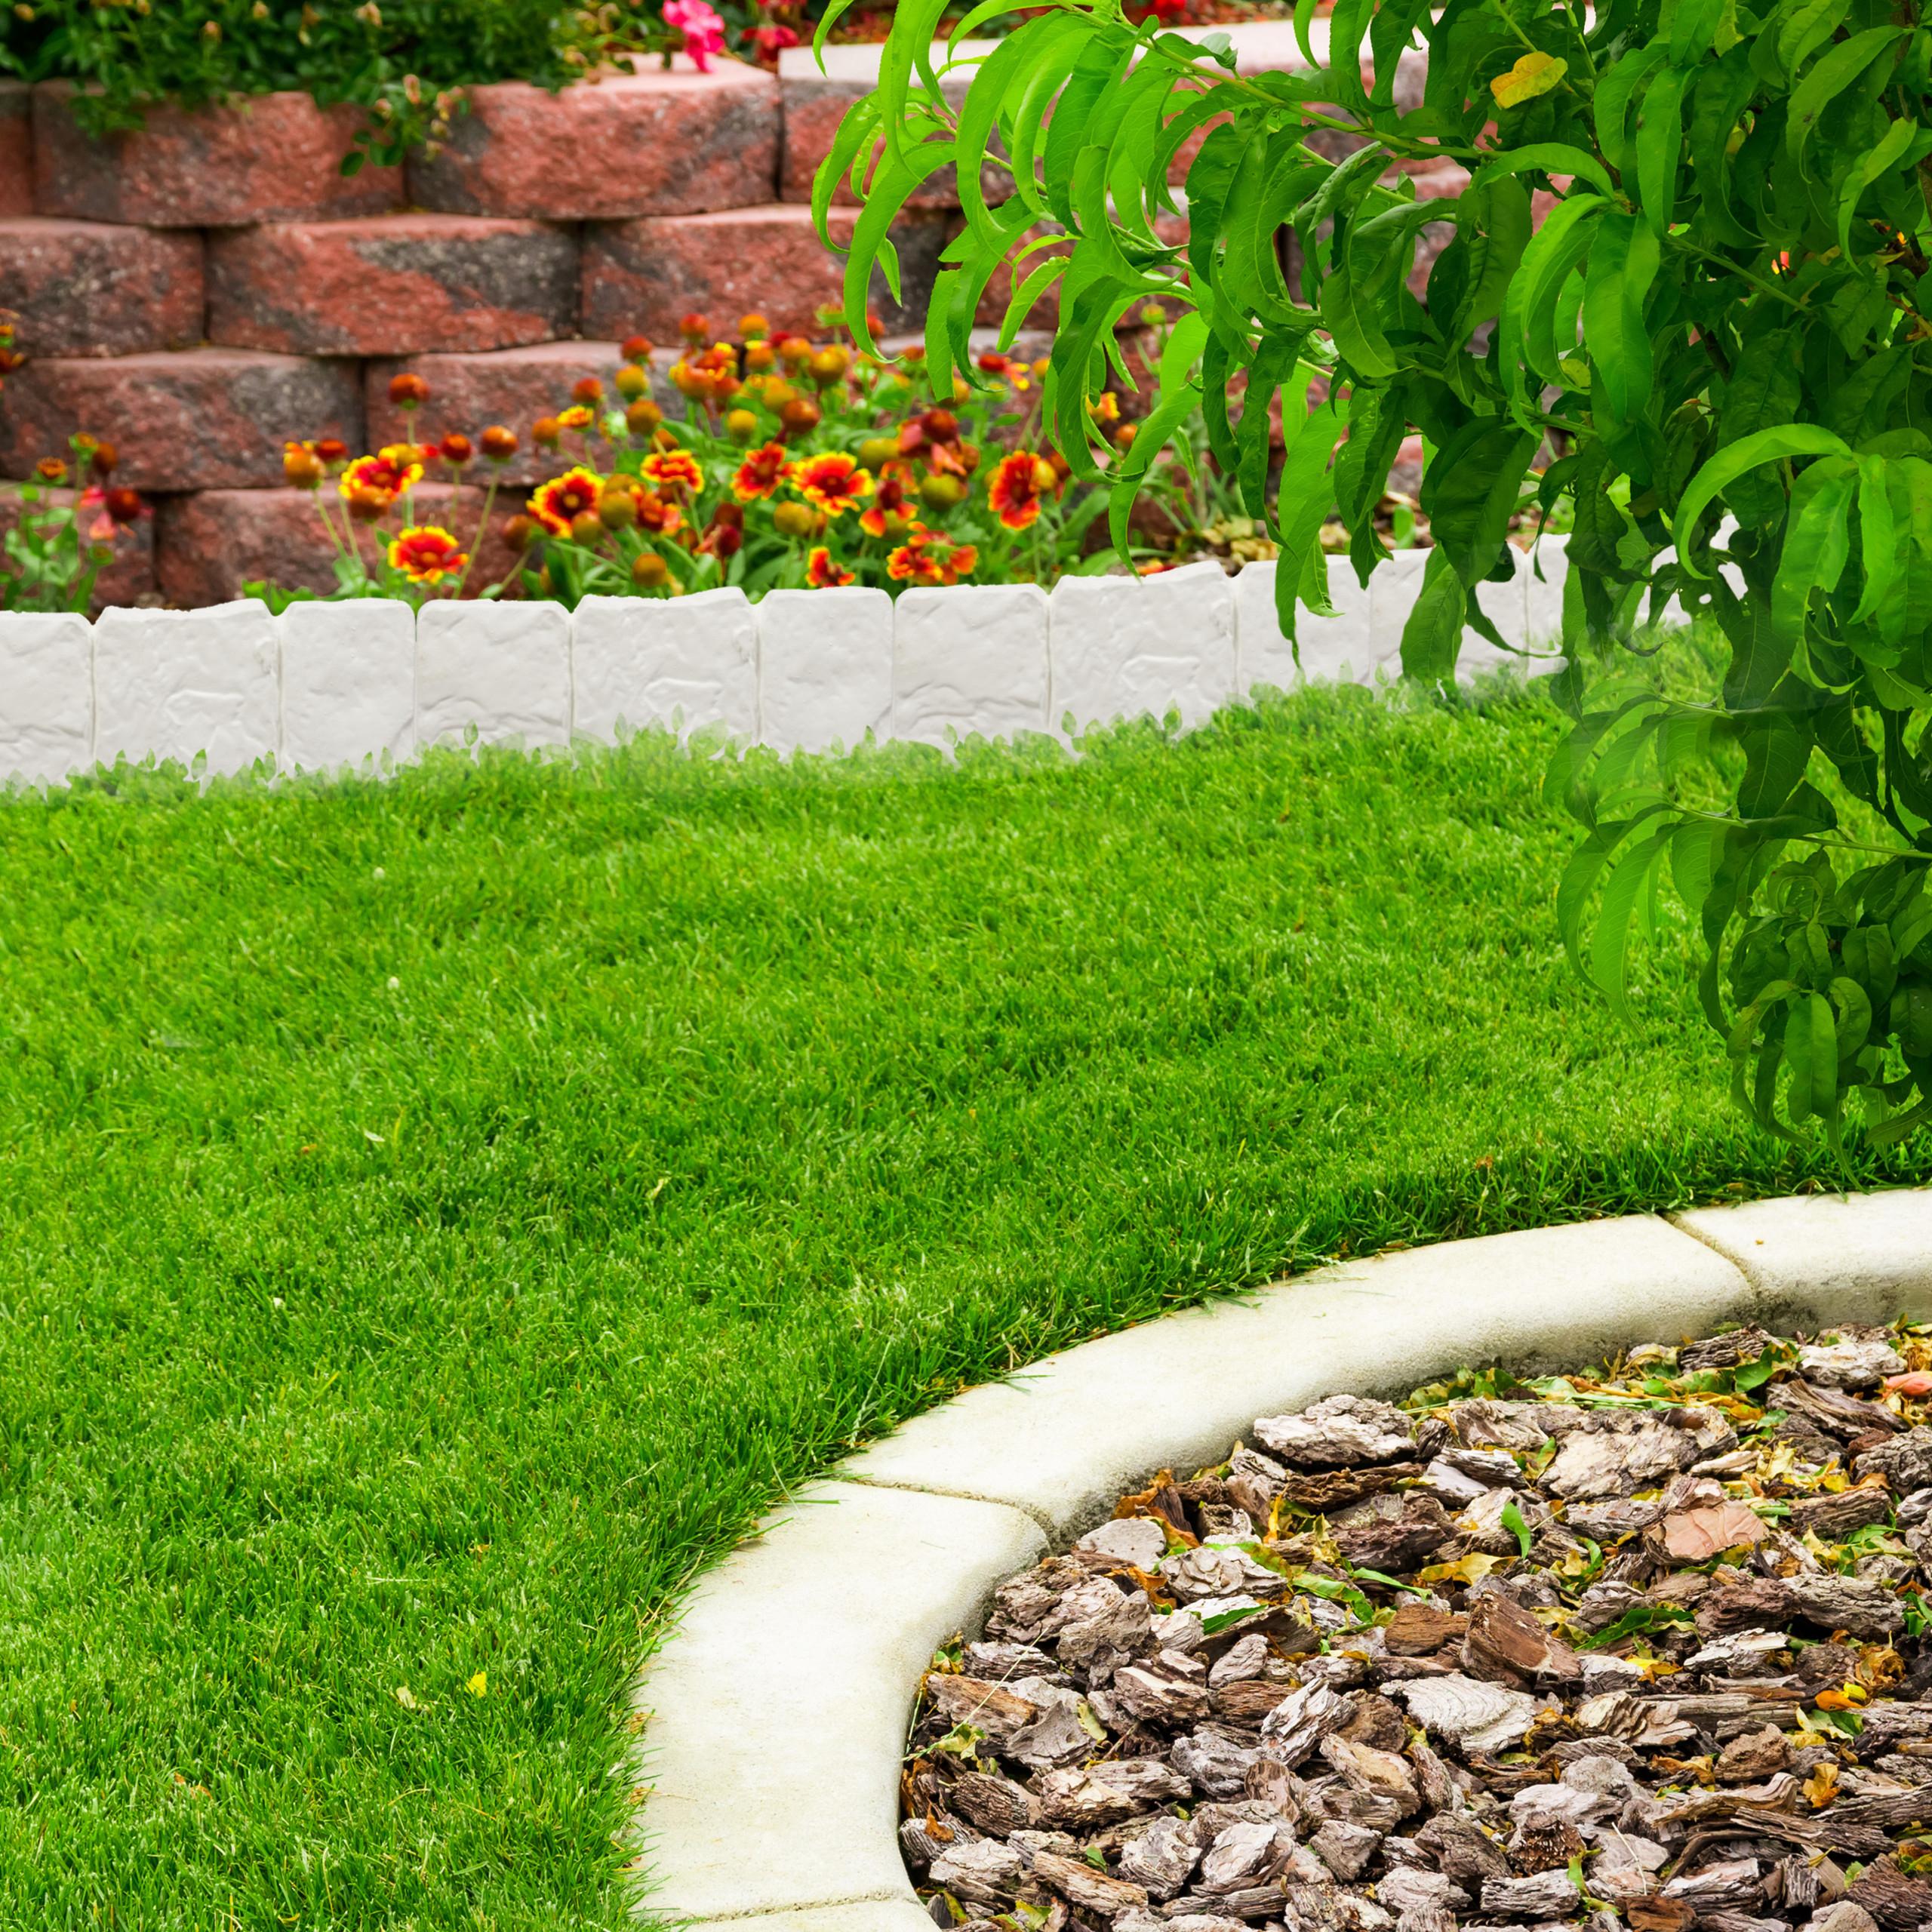 Relaxdays Bordure De Jardin Clôture Gazon 10 Éléments ... dedans Bordure De Jardin En Pierre